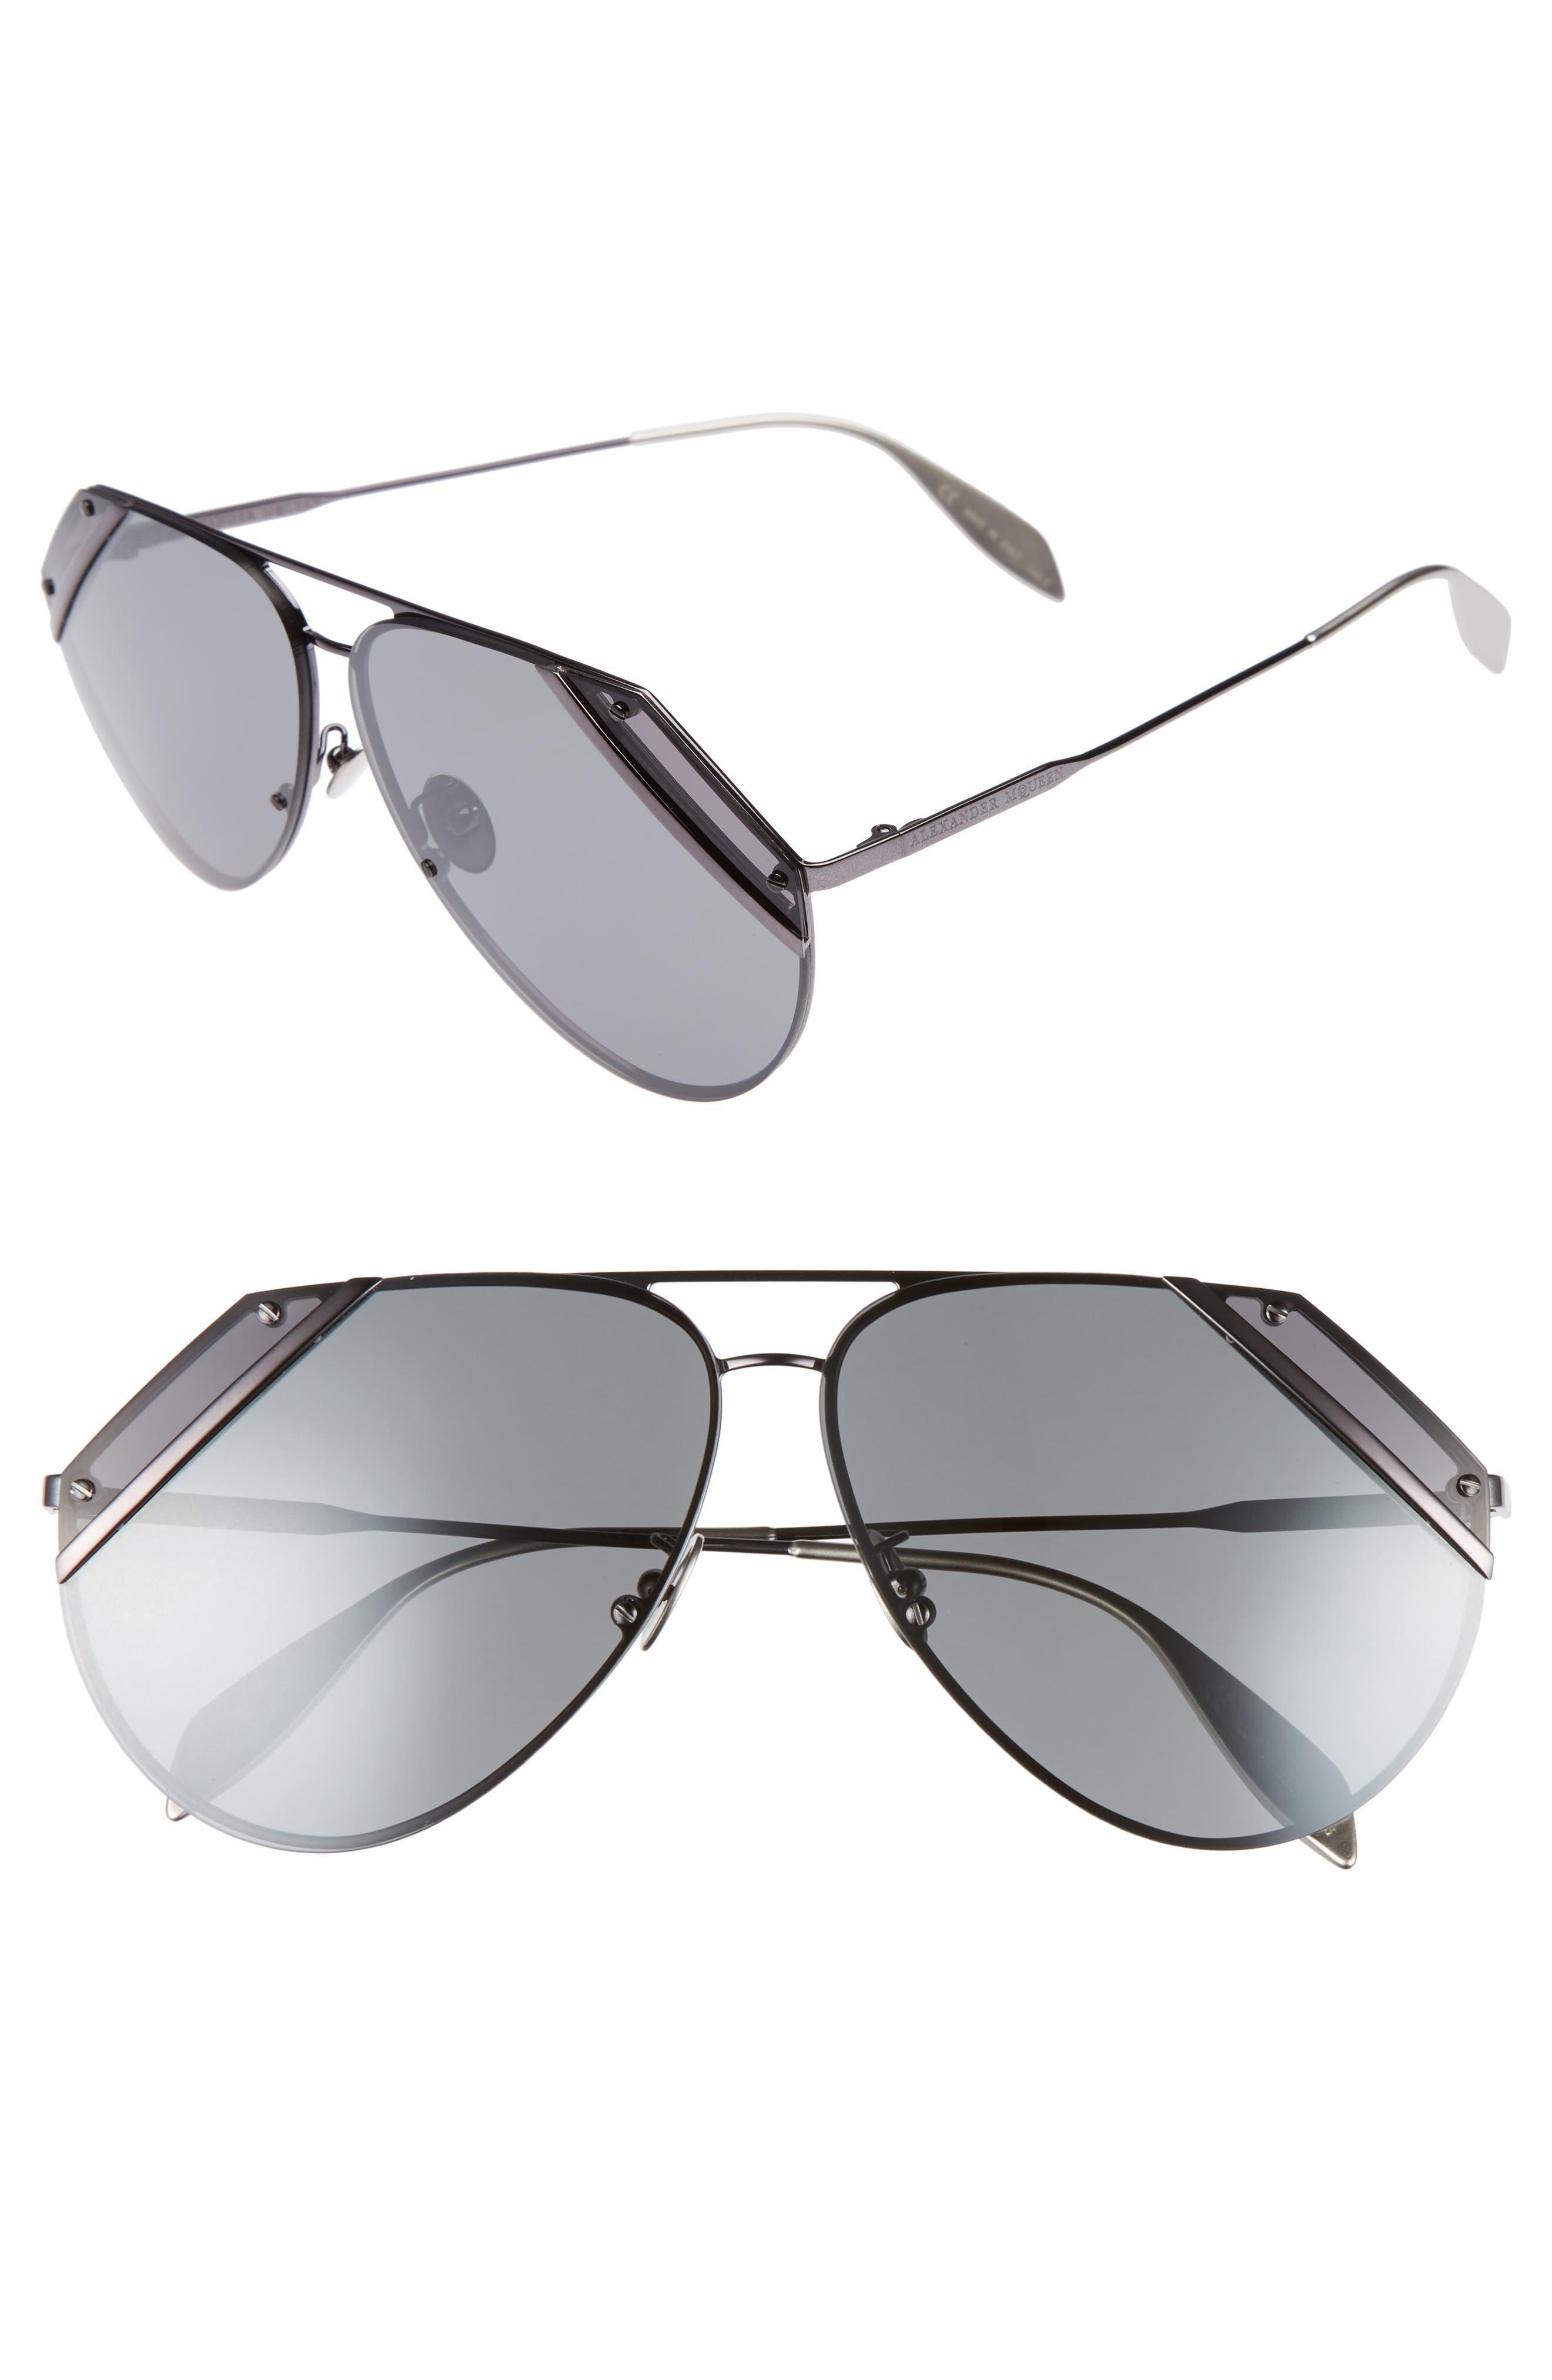 Main Image - Alexander McQueen 65mm Snip Frame Aviator Sunglasses